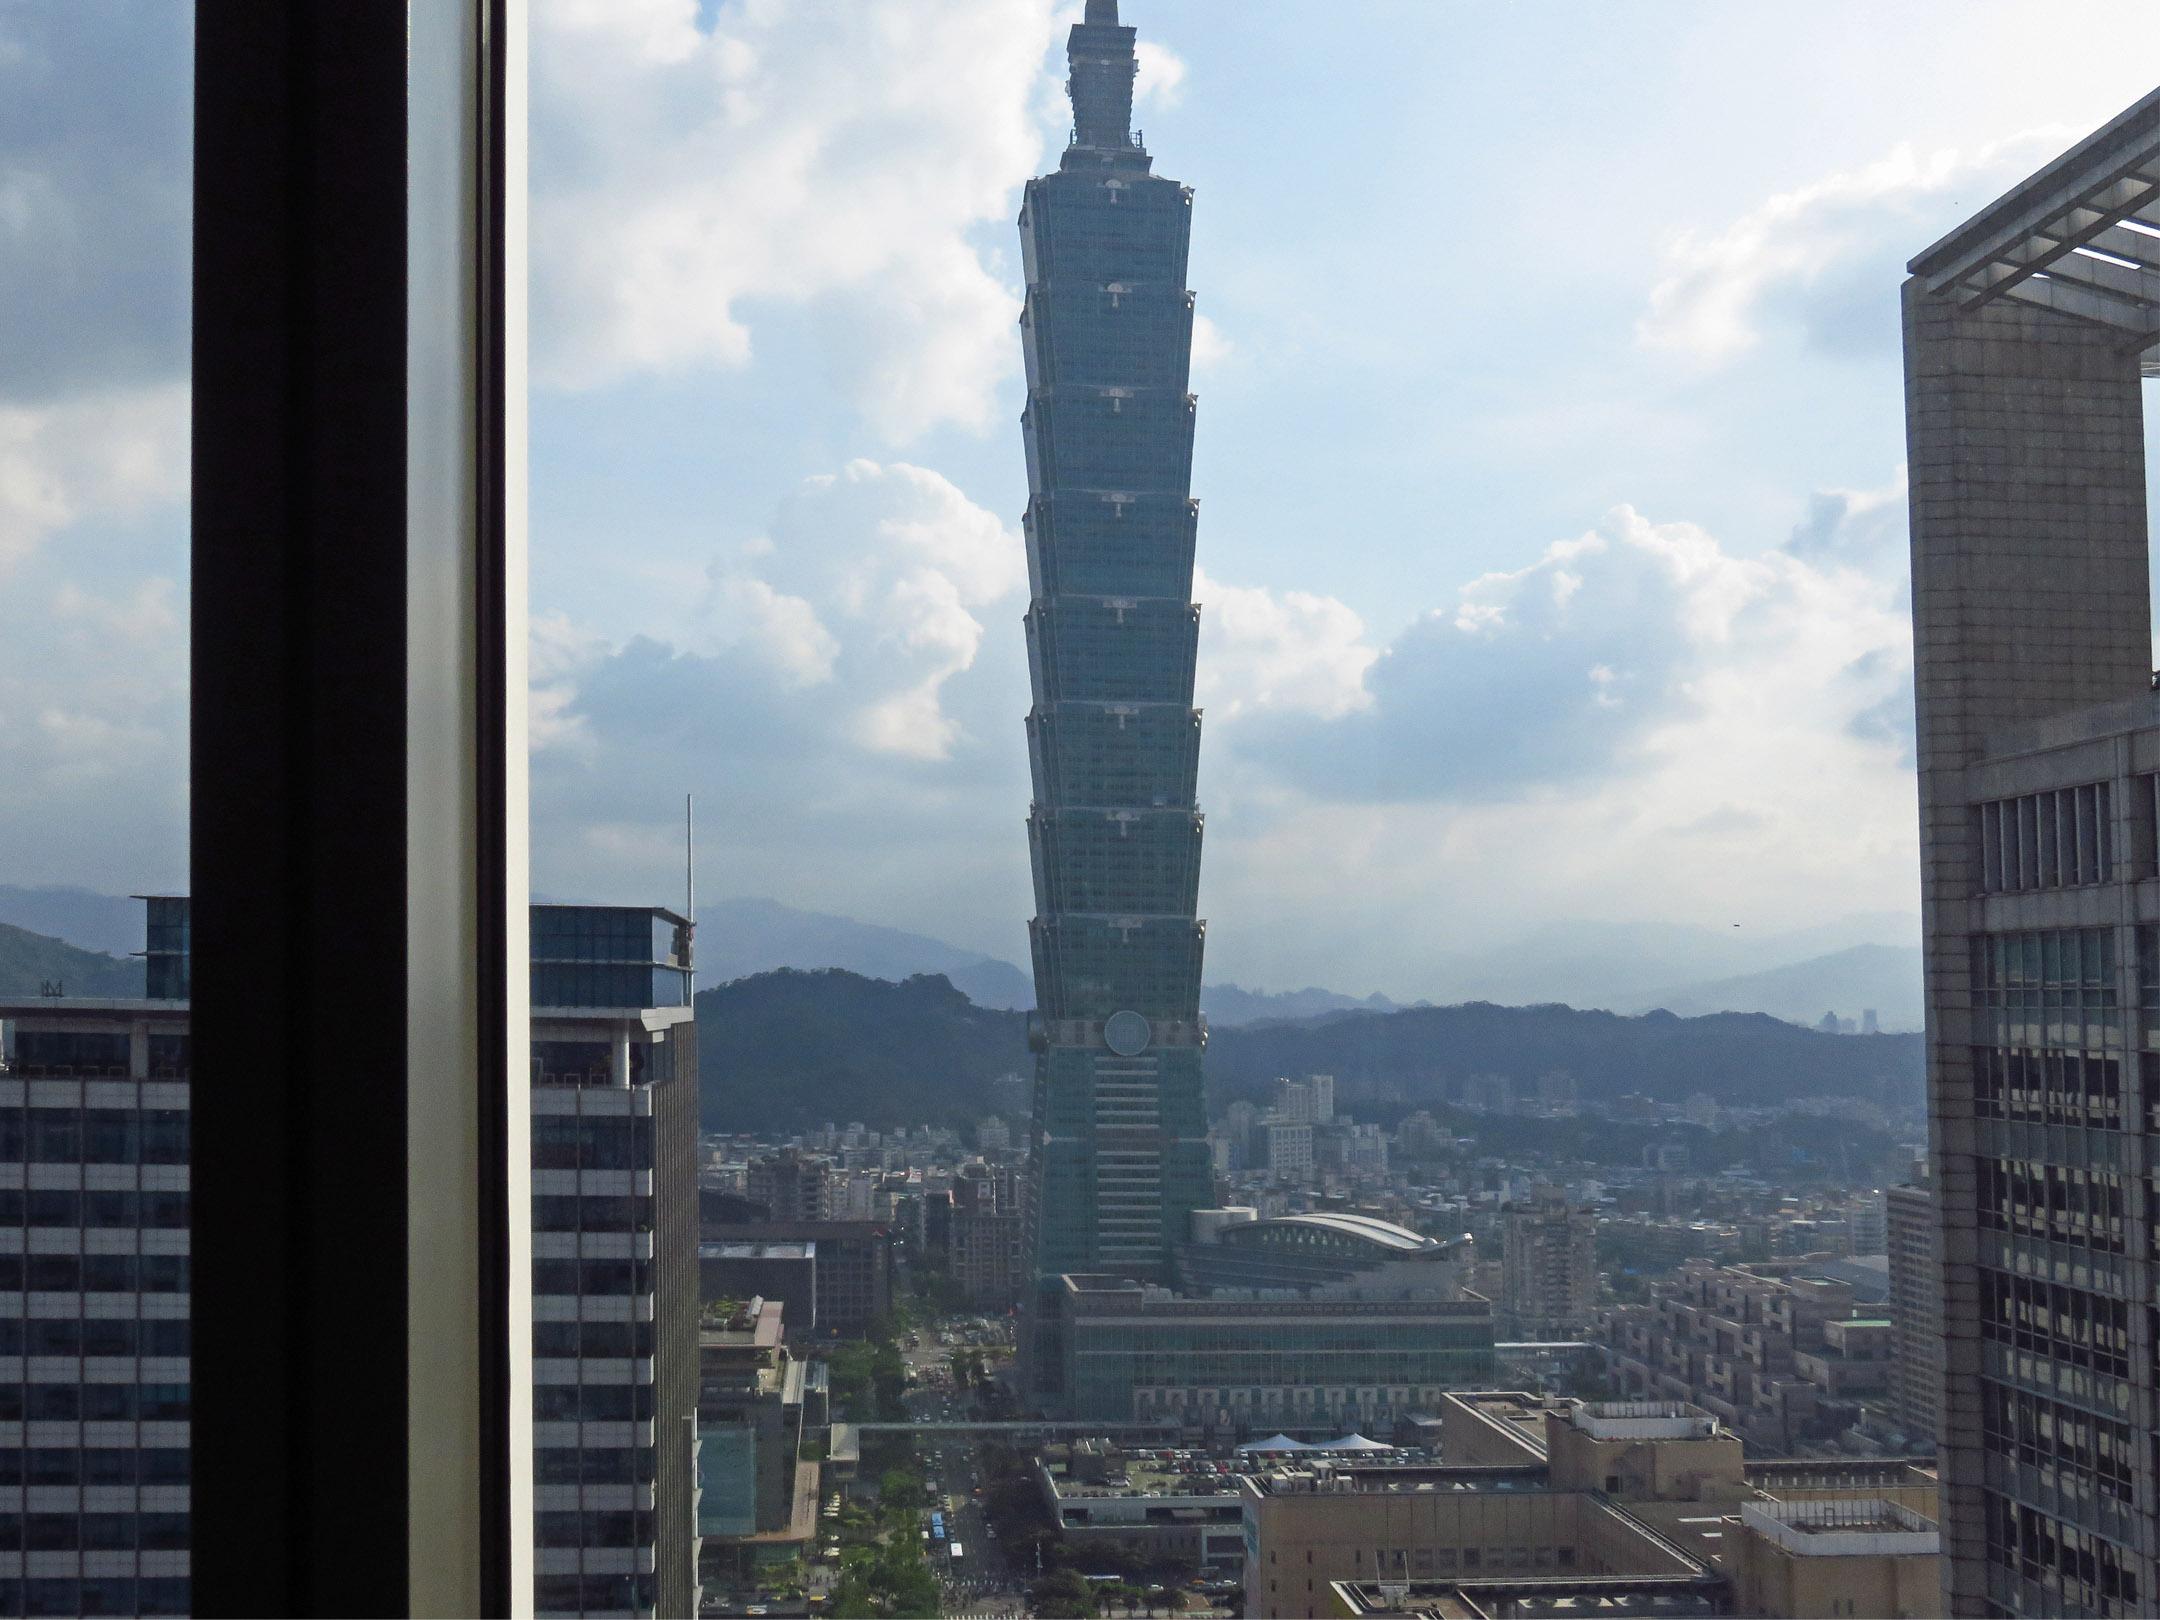 3. A view of Taipei 101